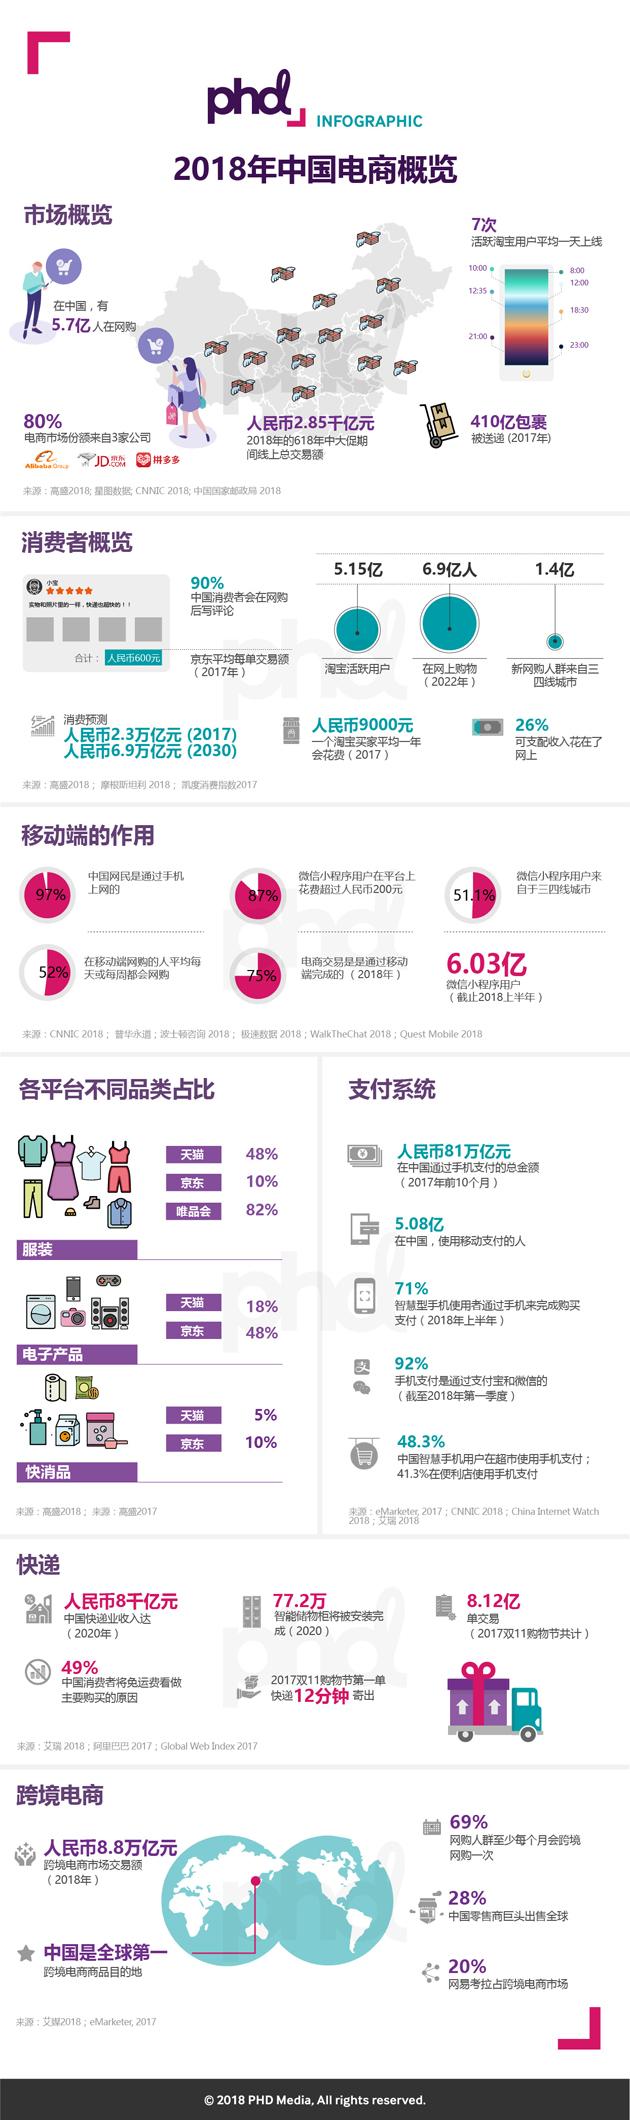 China E-Commerce Landscape 2018